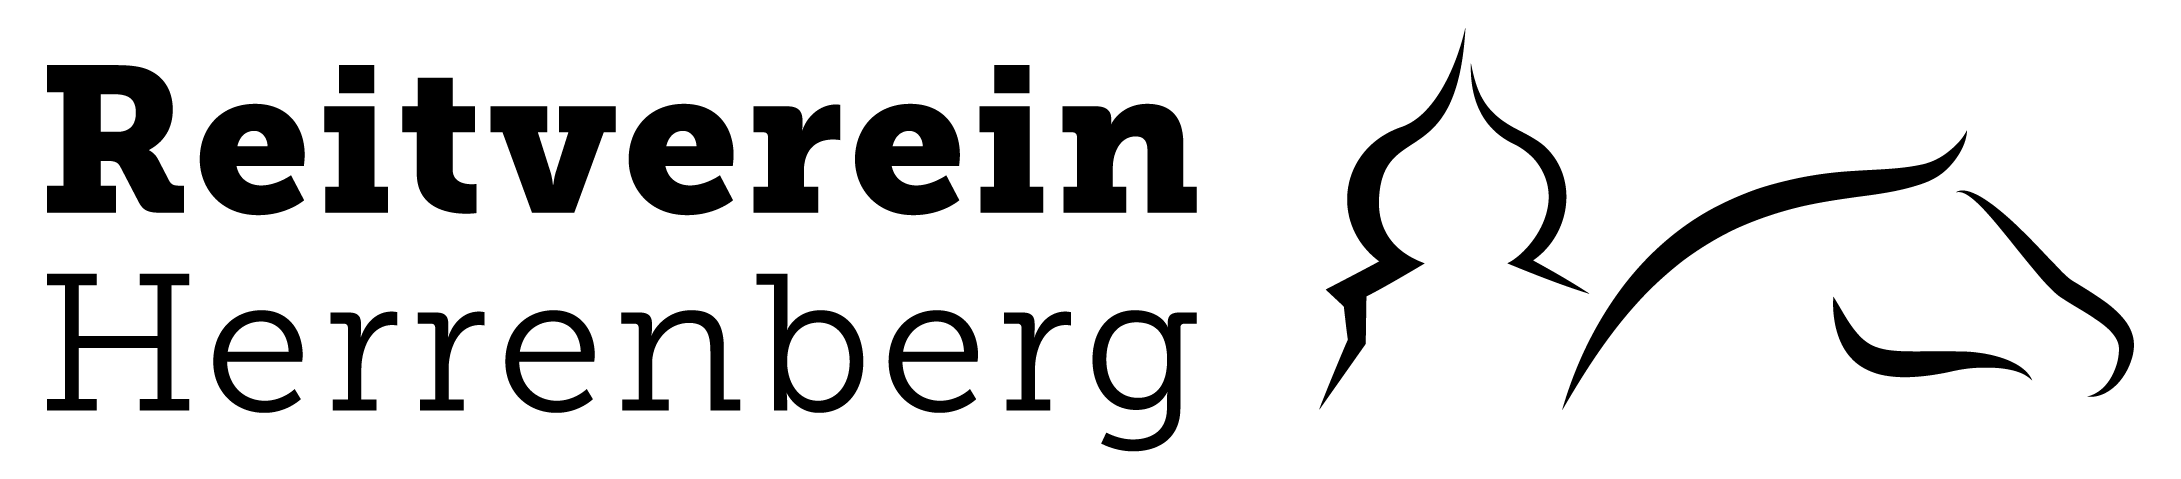 Reitverein Herrenberg Logo